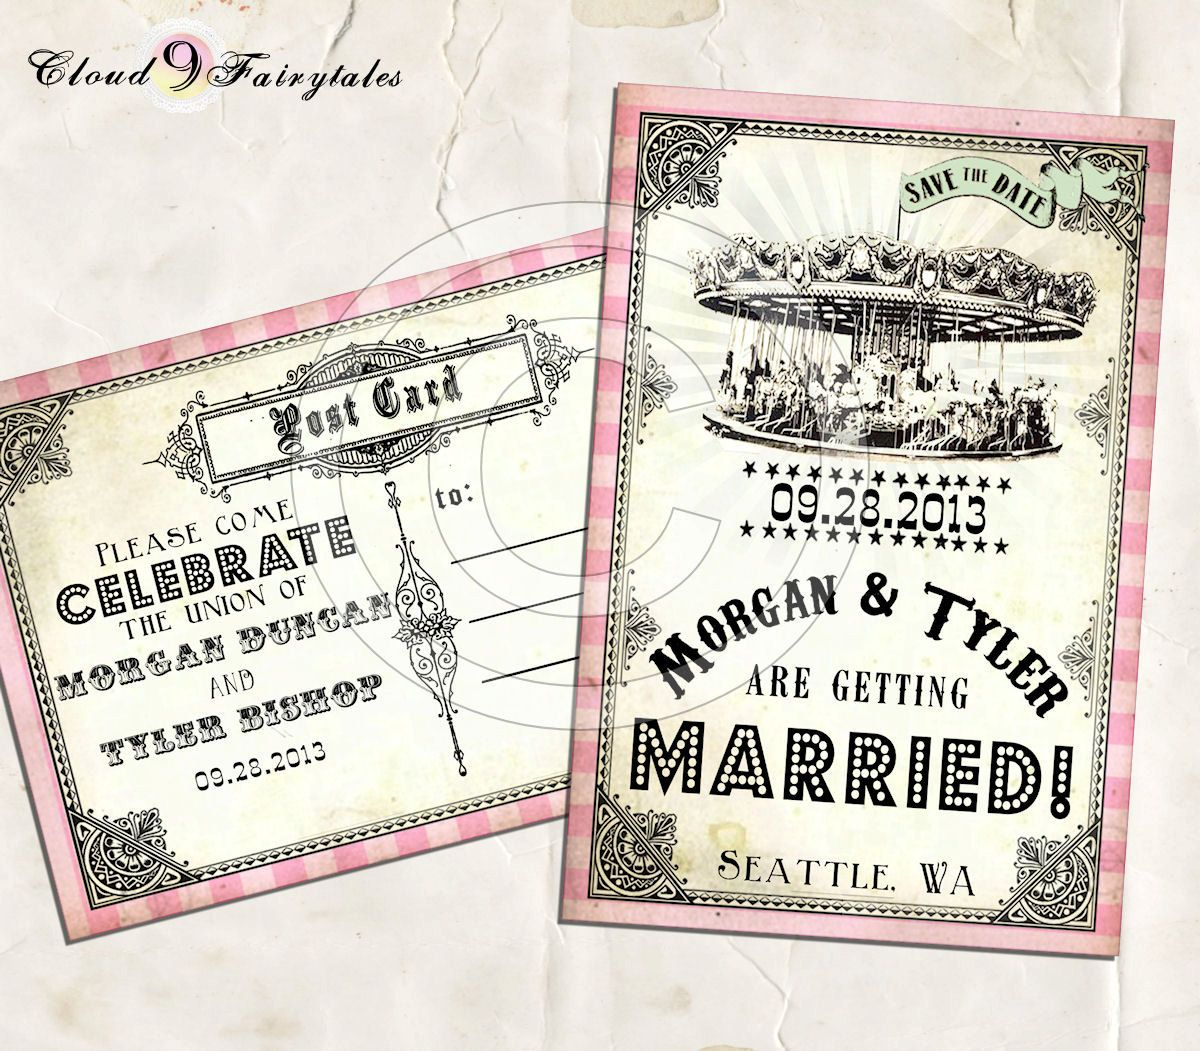 Carousel Save The Date Vintage PostCards Wedding Invitations ...